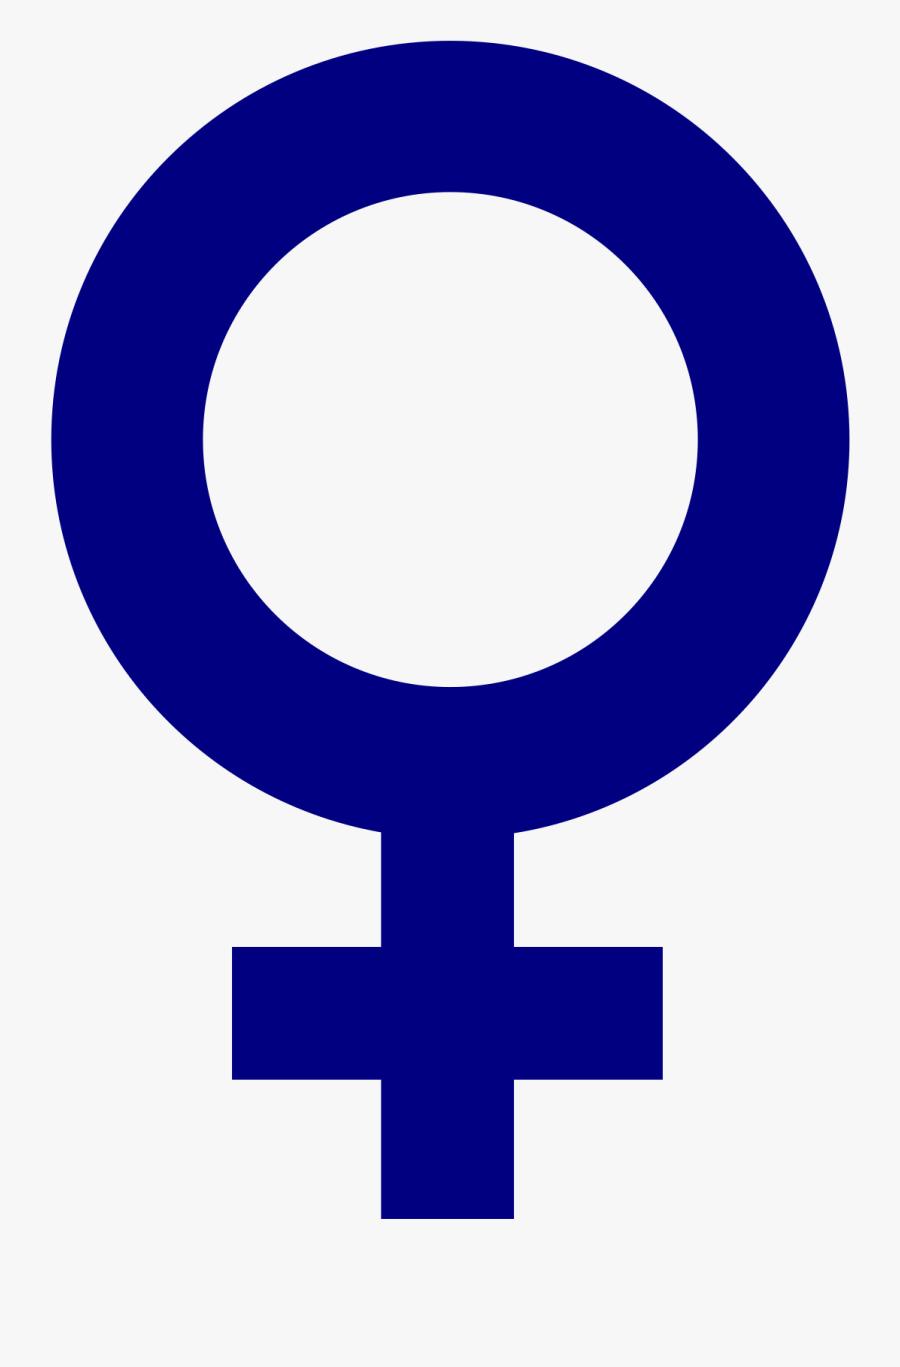 Area,text,symbol - Female Gender Symbol Small, Transparent Clipart